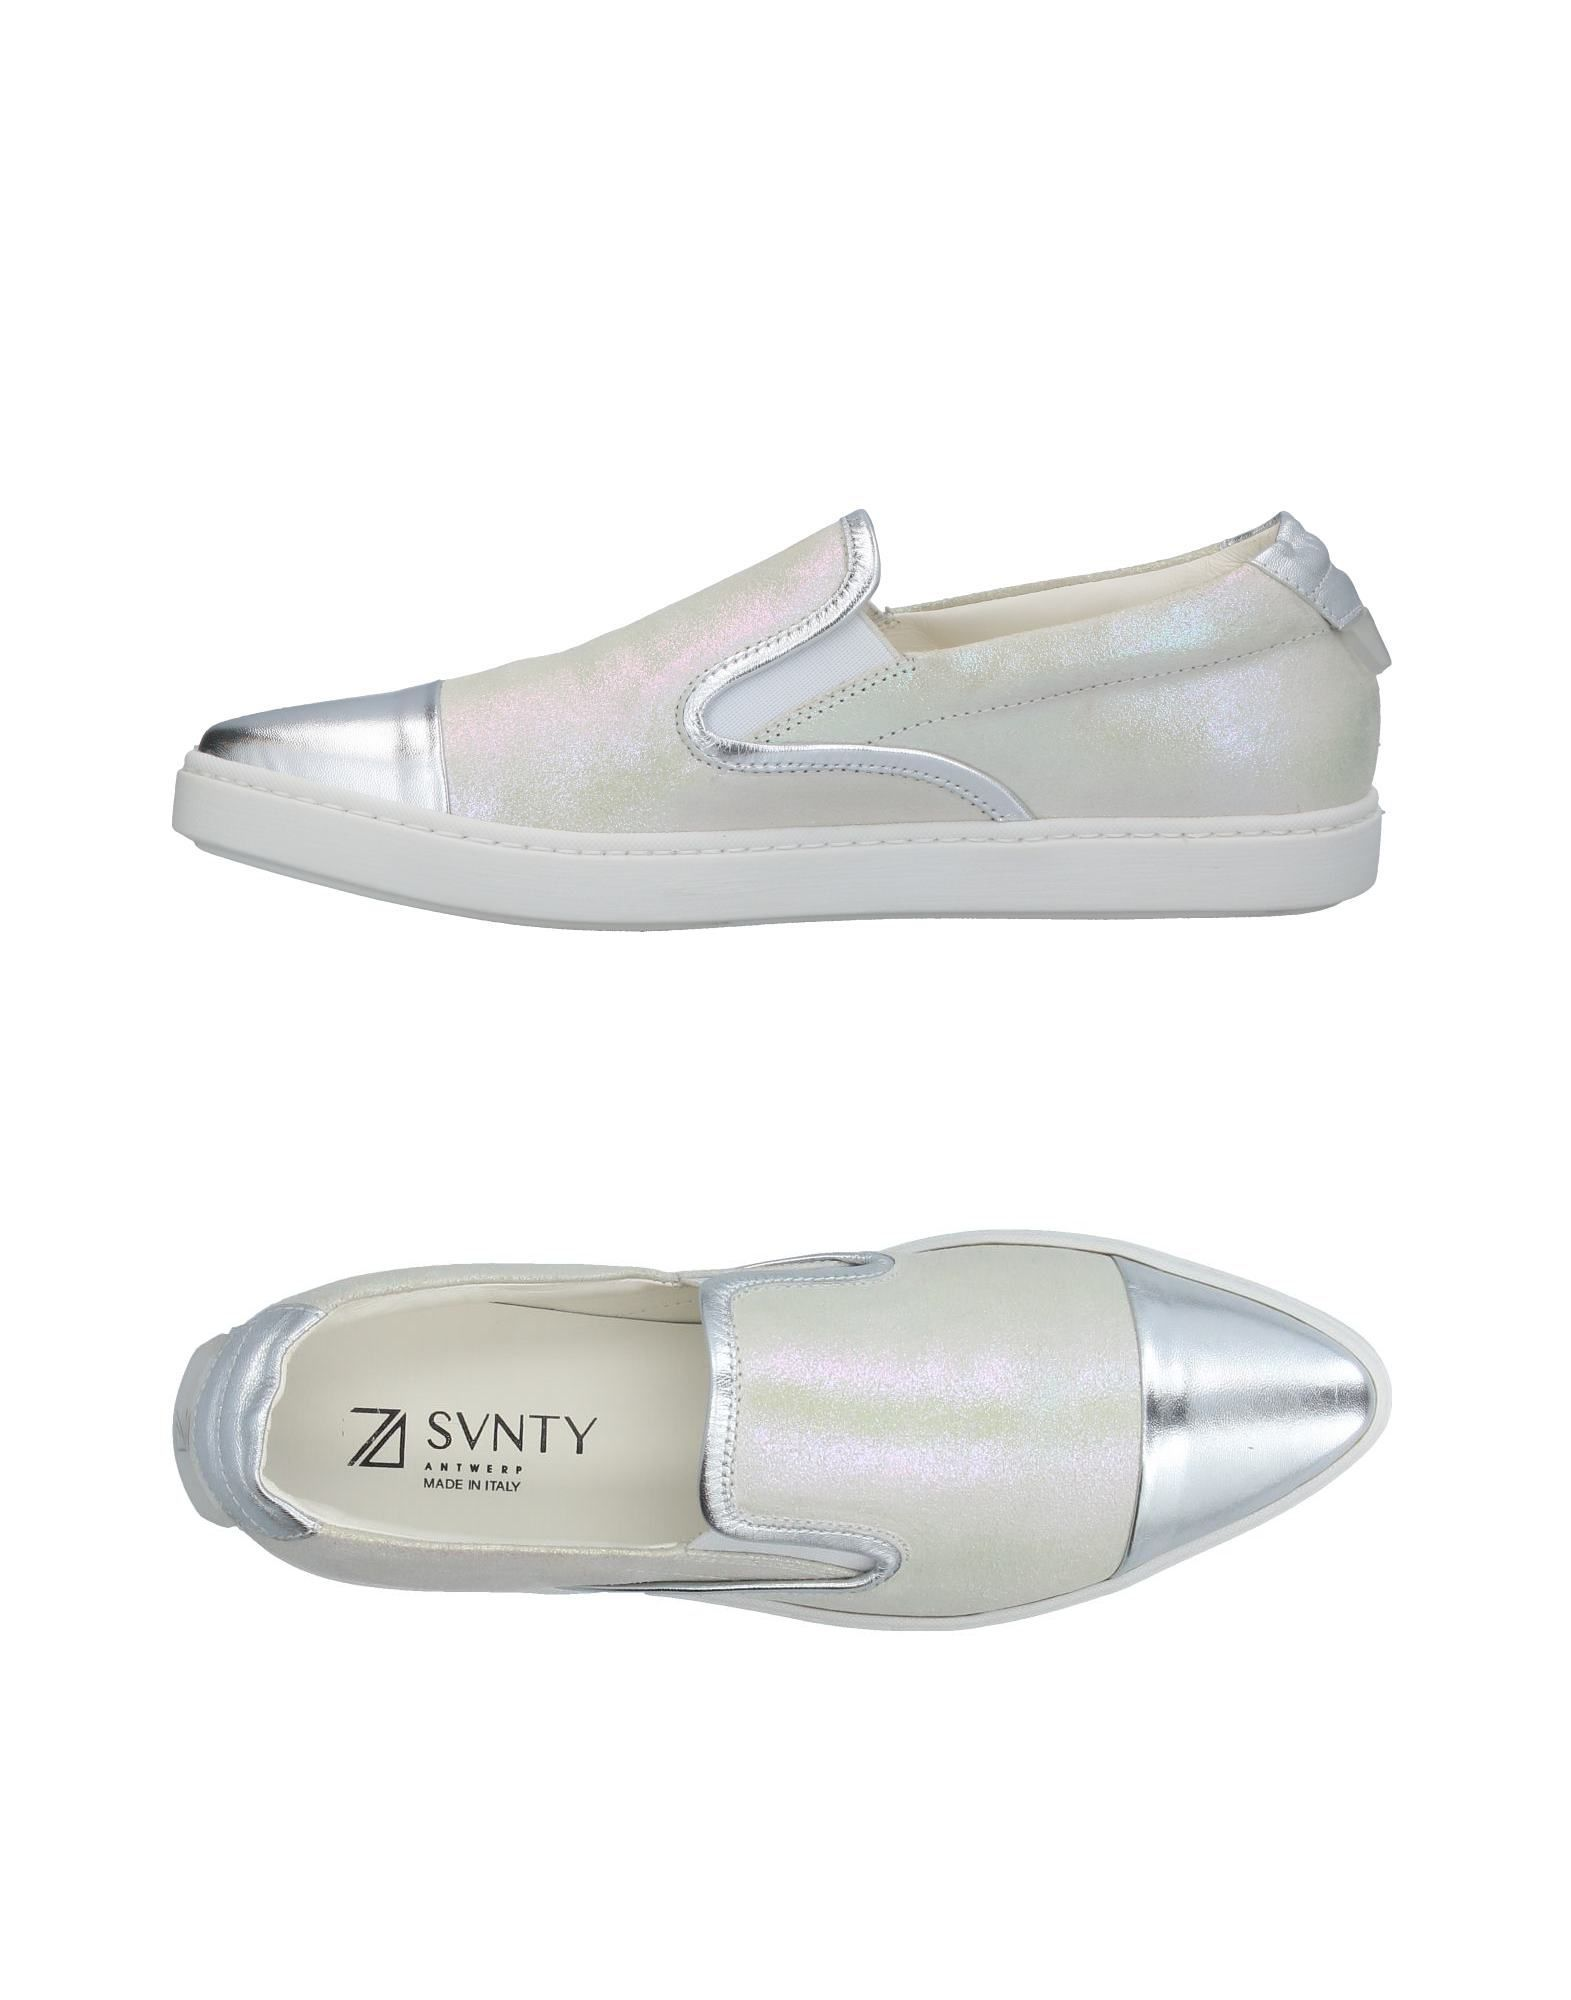 A buon mercato Sneakers Svnty Donna - 11392746IC